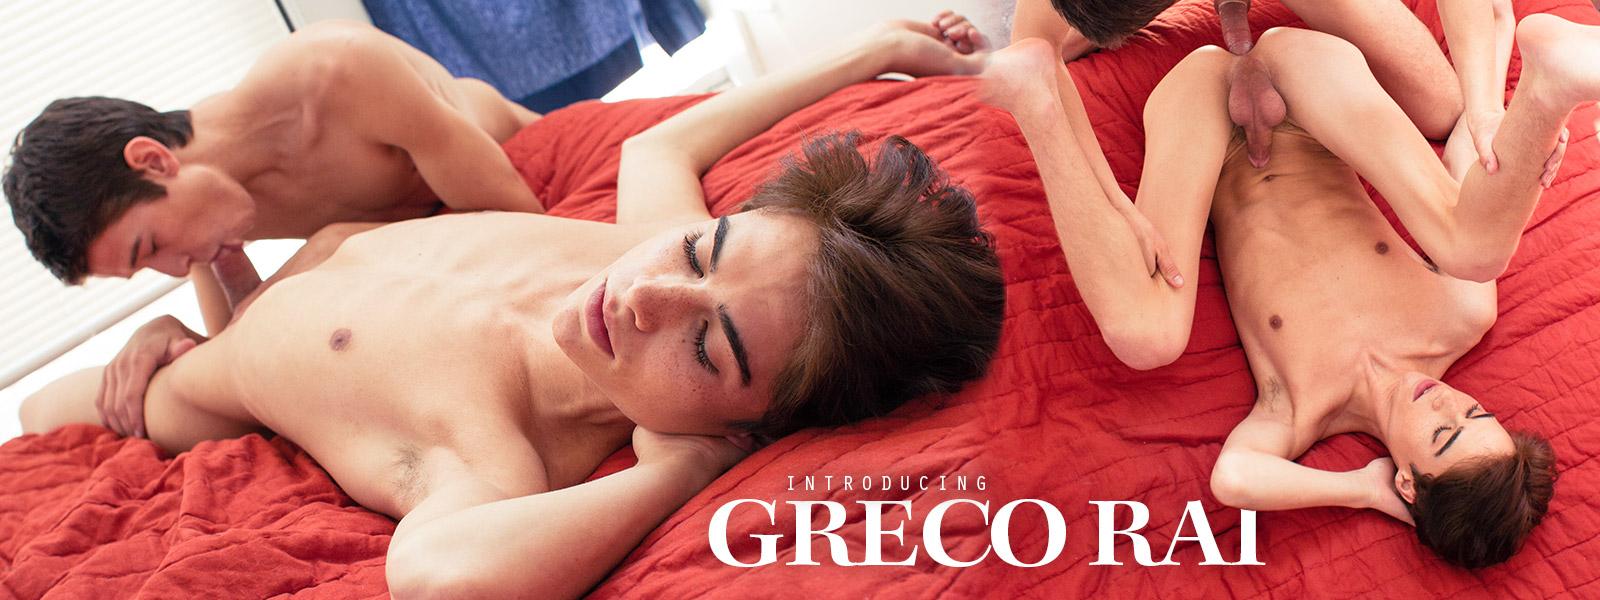 Introducing Greco Rai